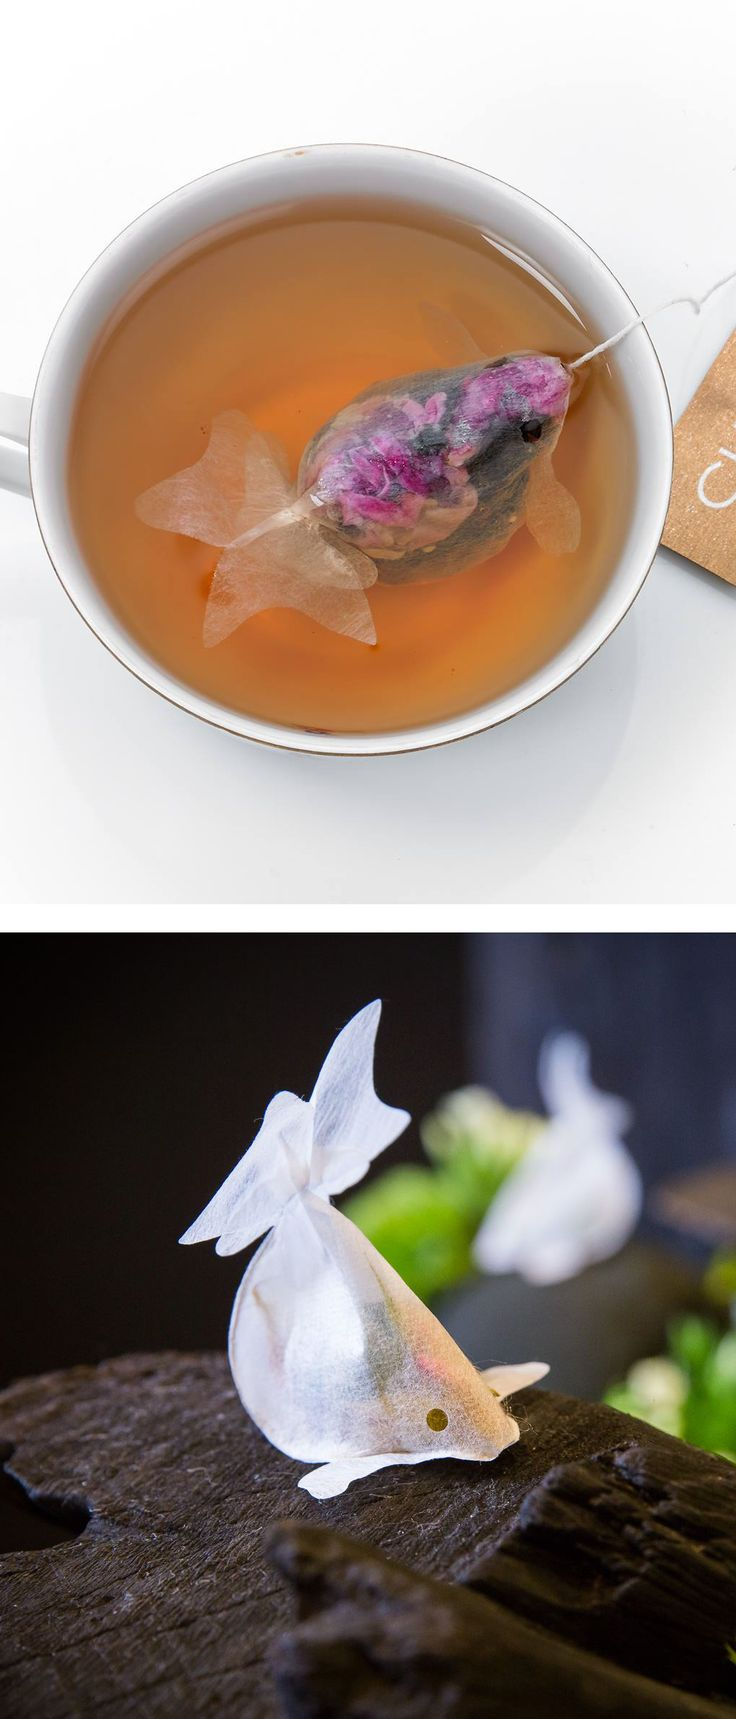 Whimsical tea bags shaped like goldfish